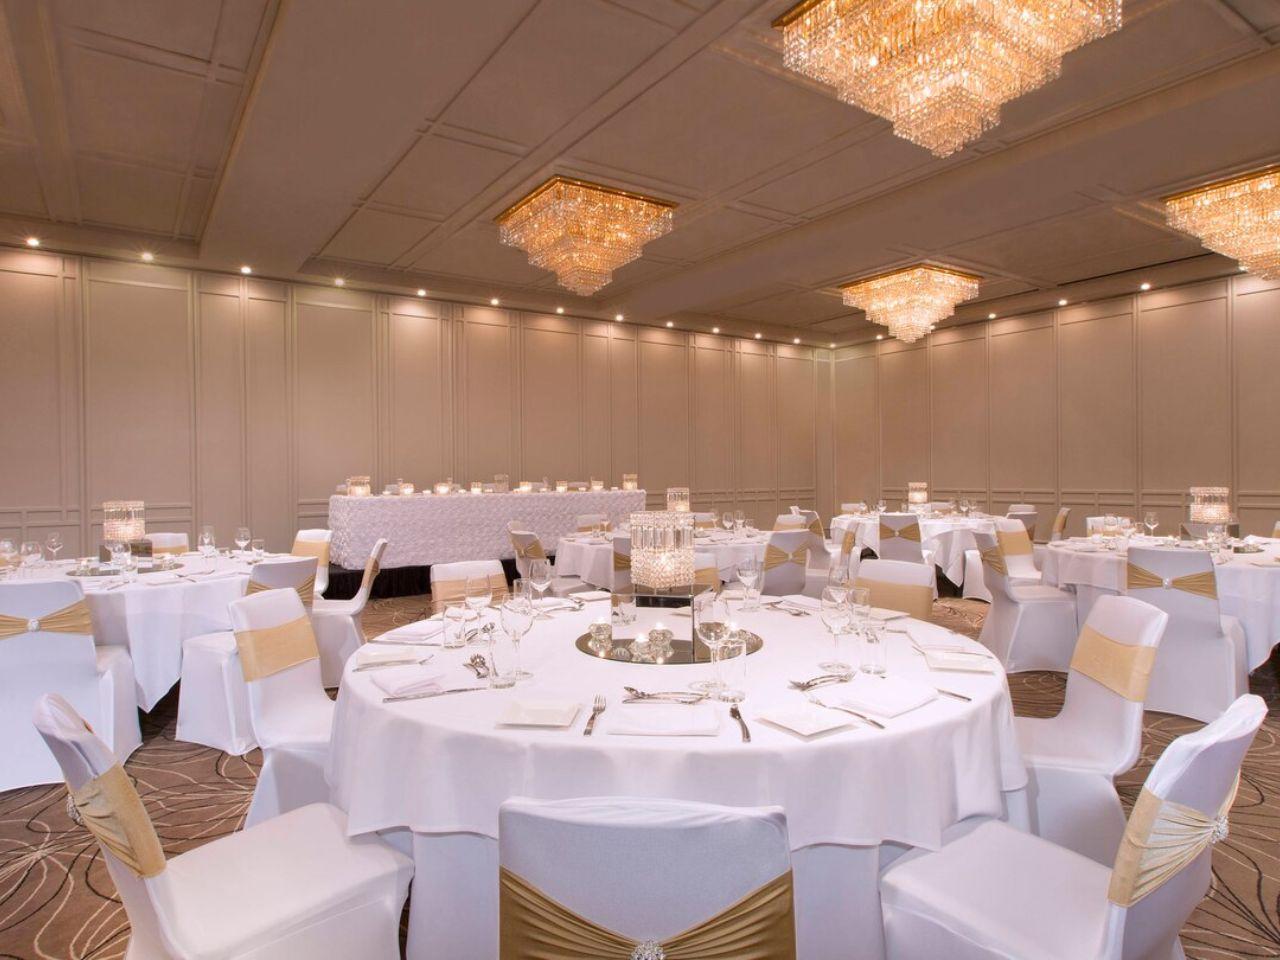 Sheraton Hotel Ballroom